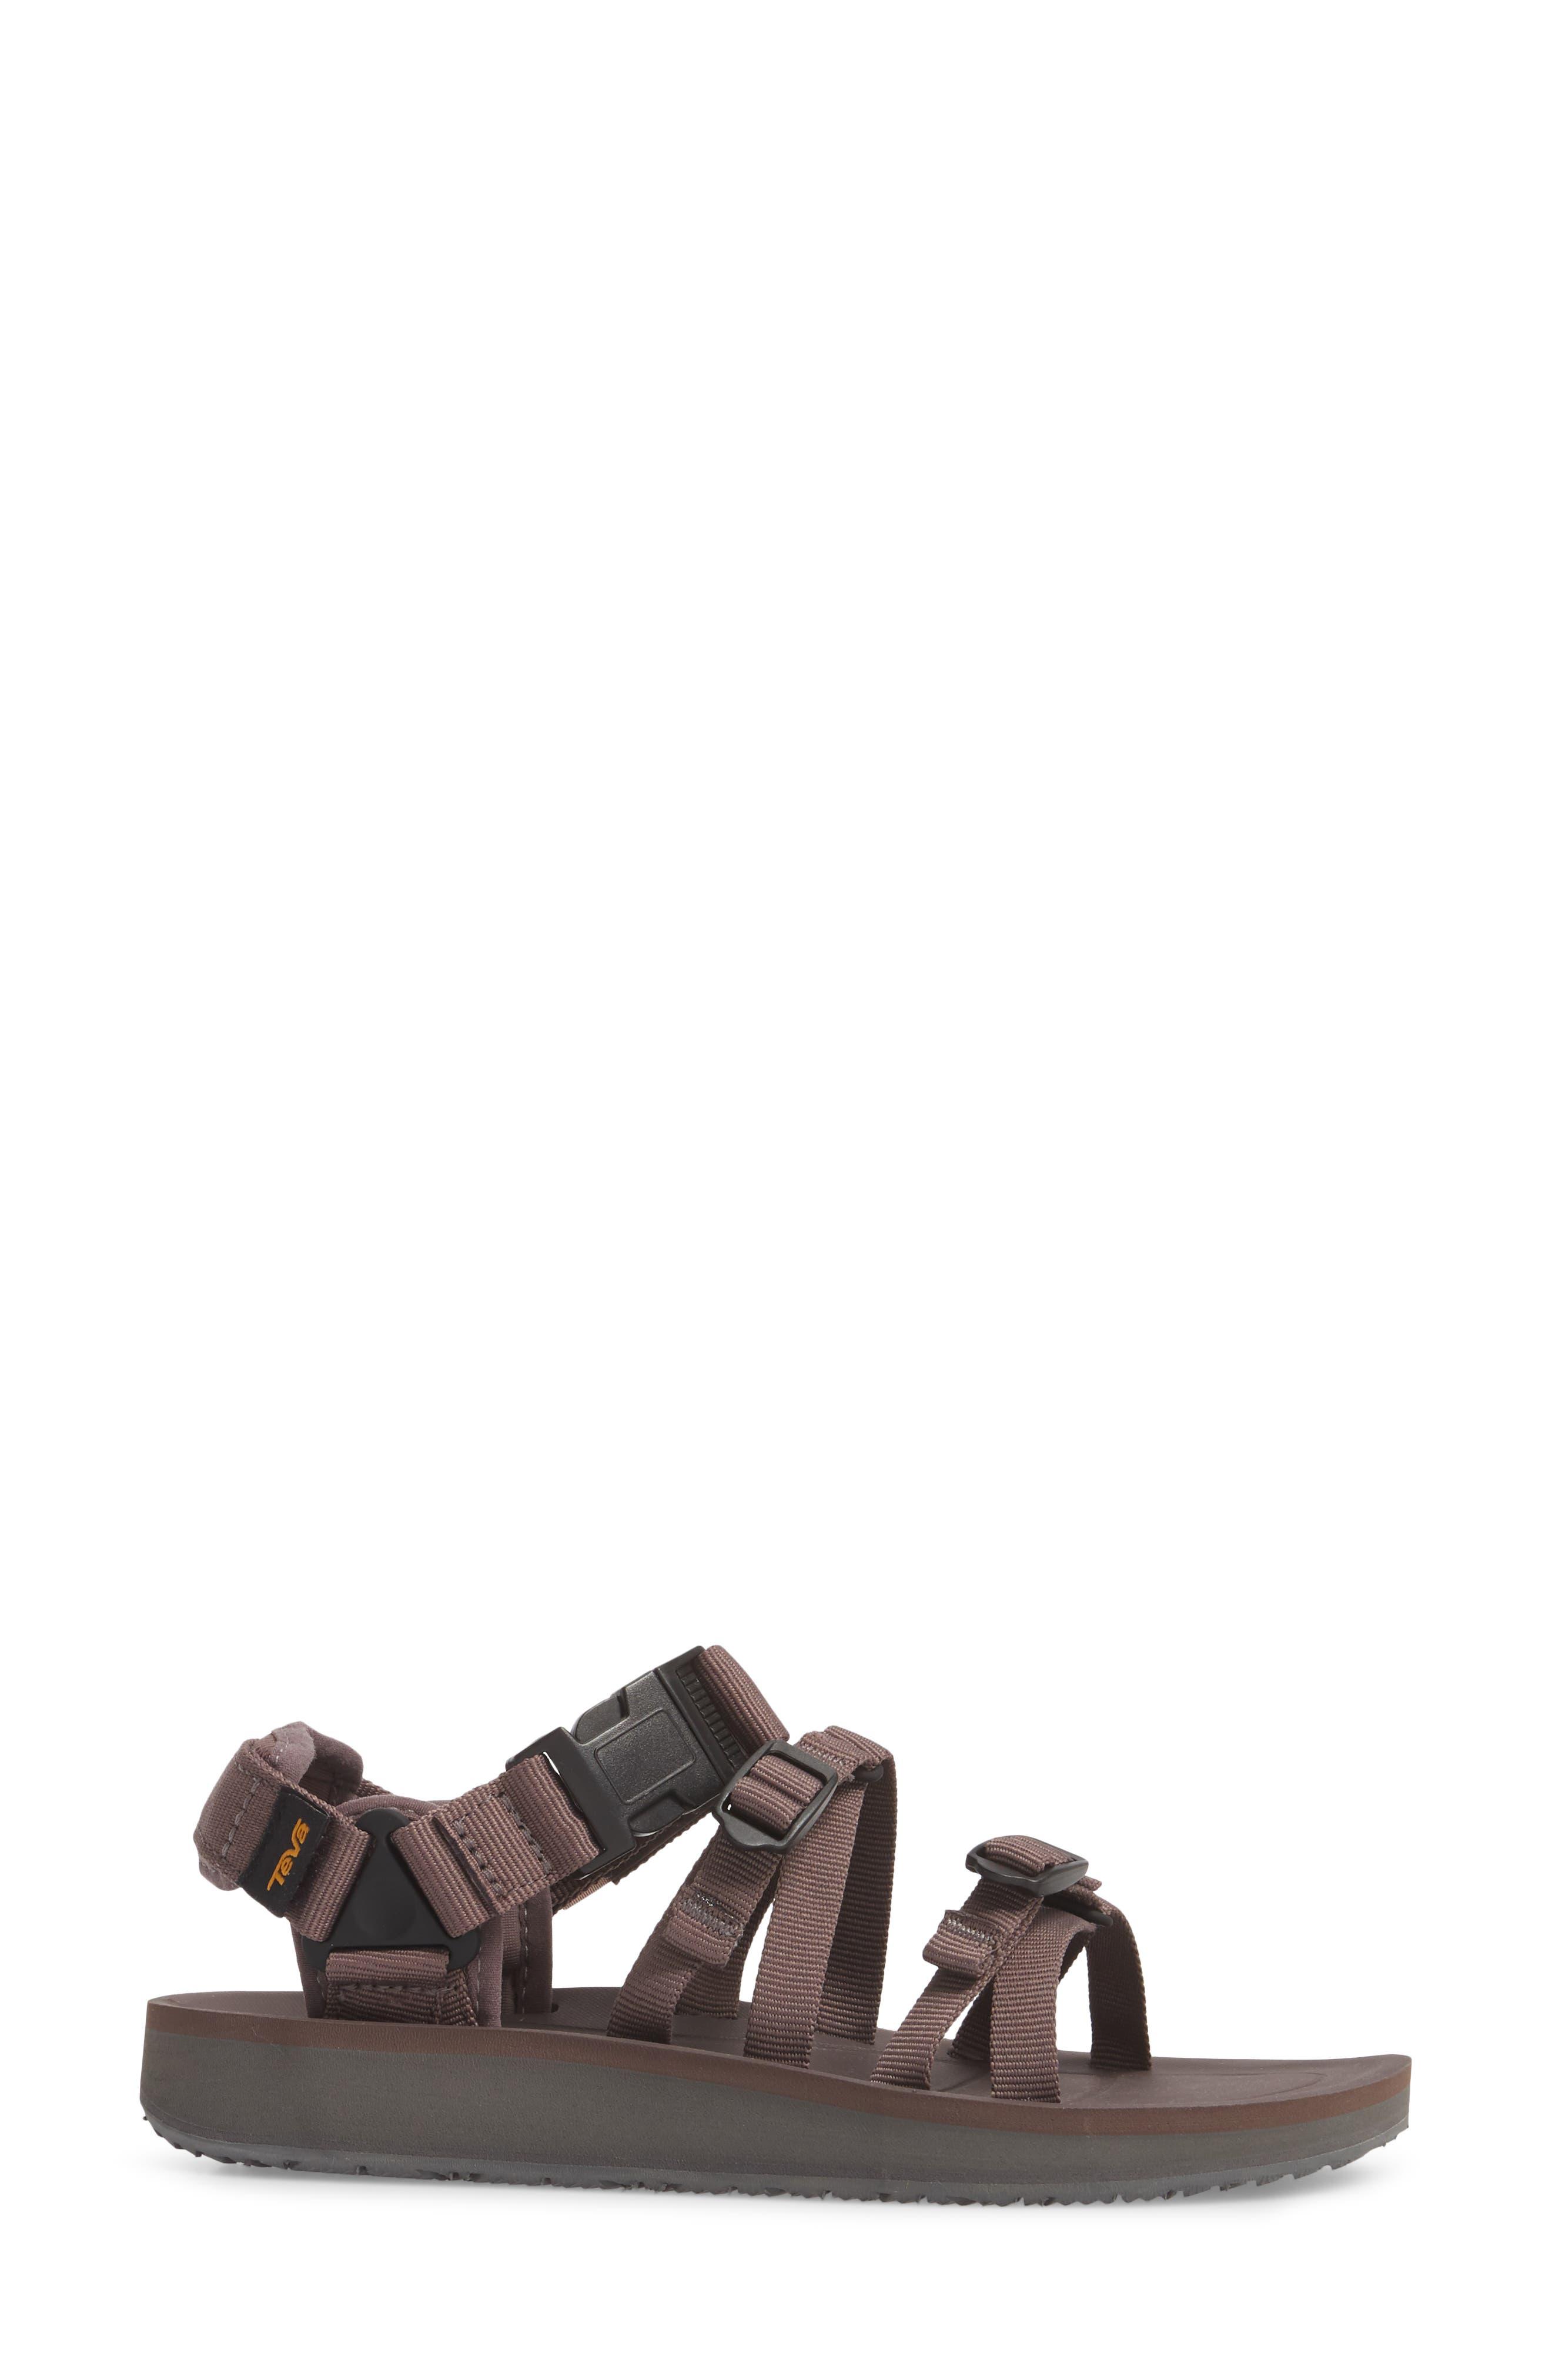 Alp II Premier Sandal,                             Alternate thumbnail 3, color,                             511